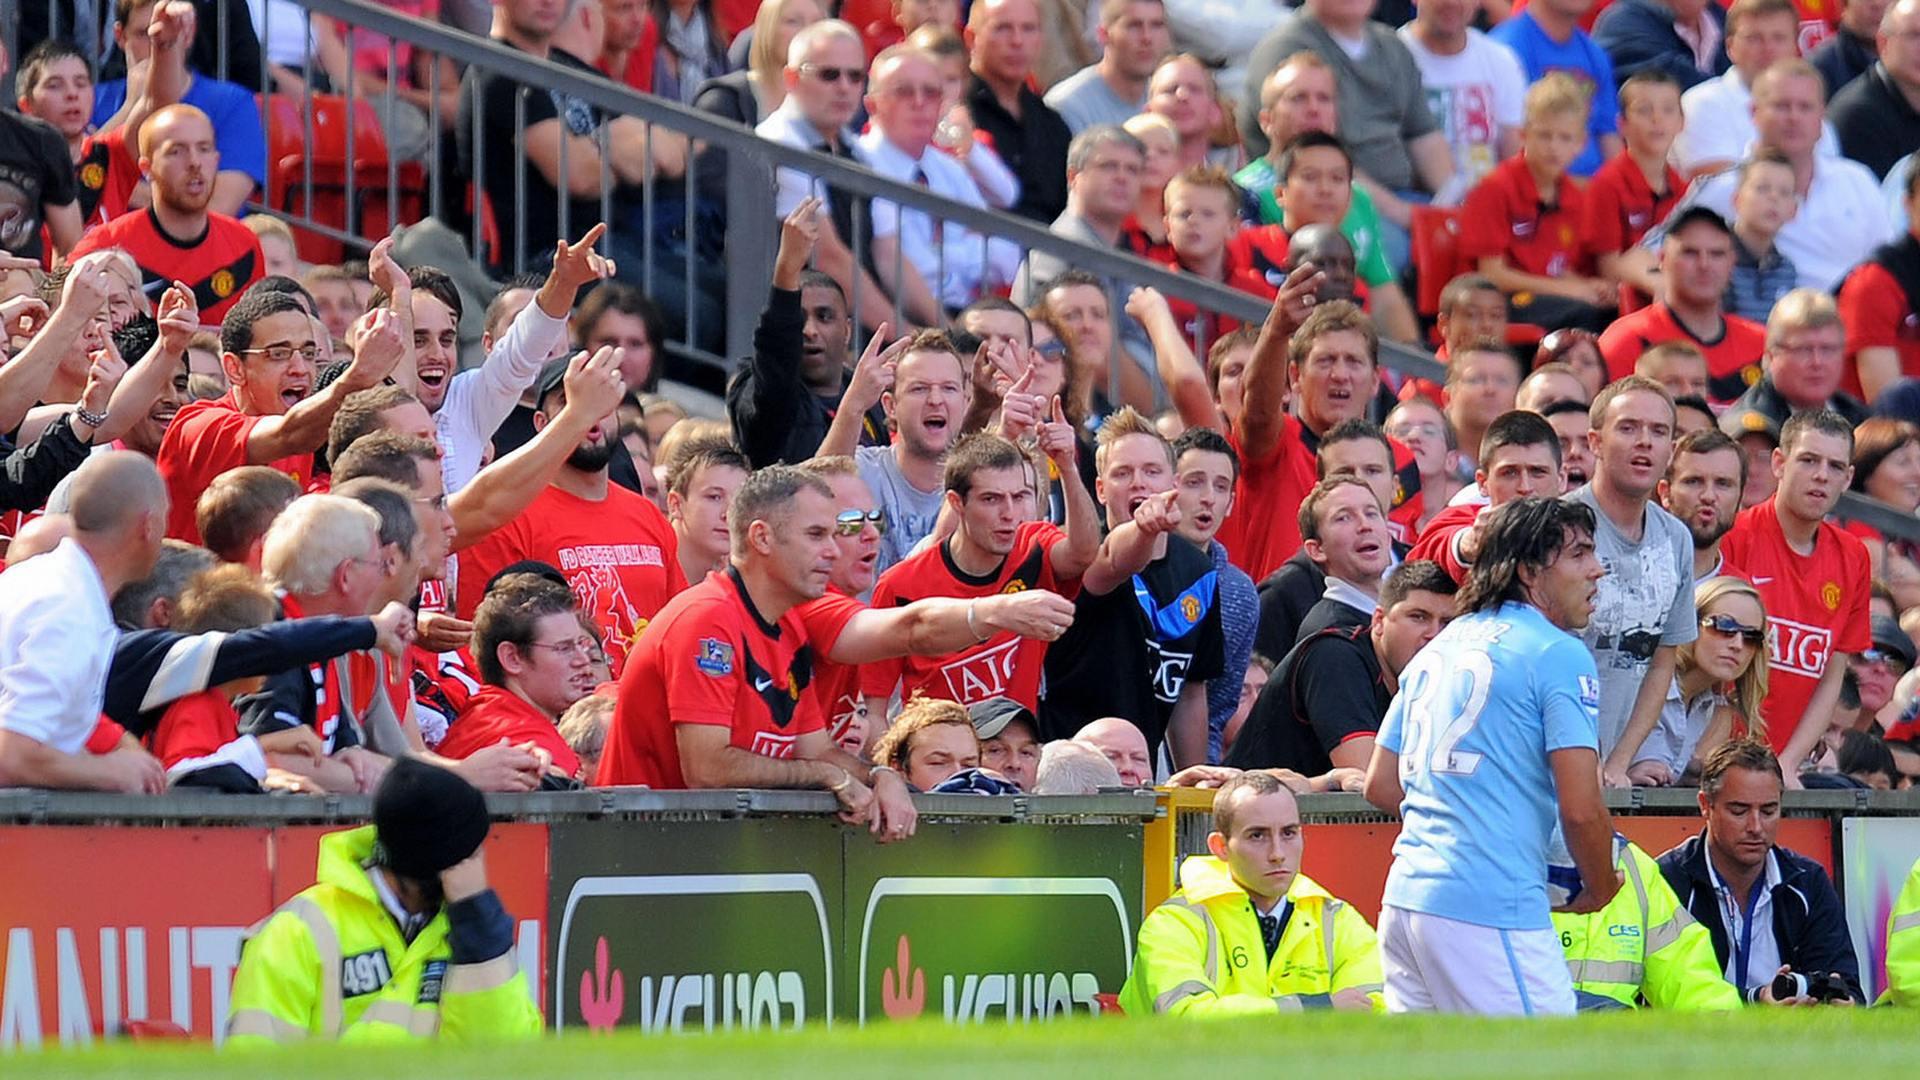 Carlos Tevez Manchester United fans